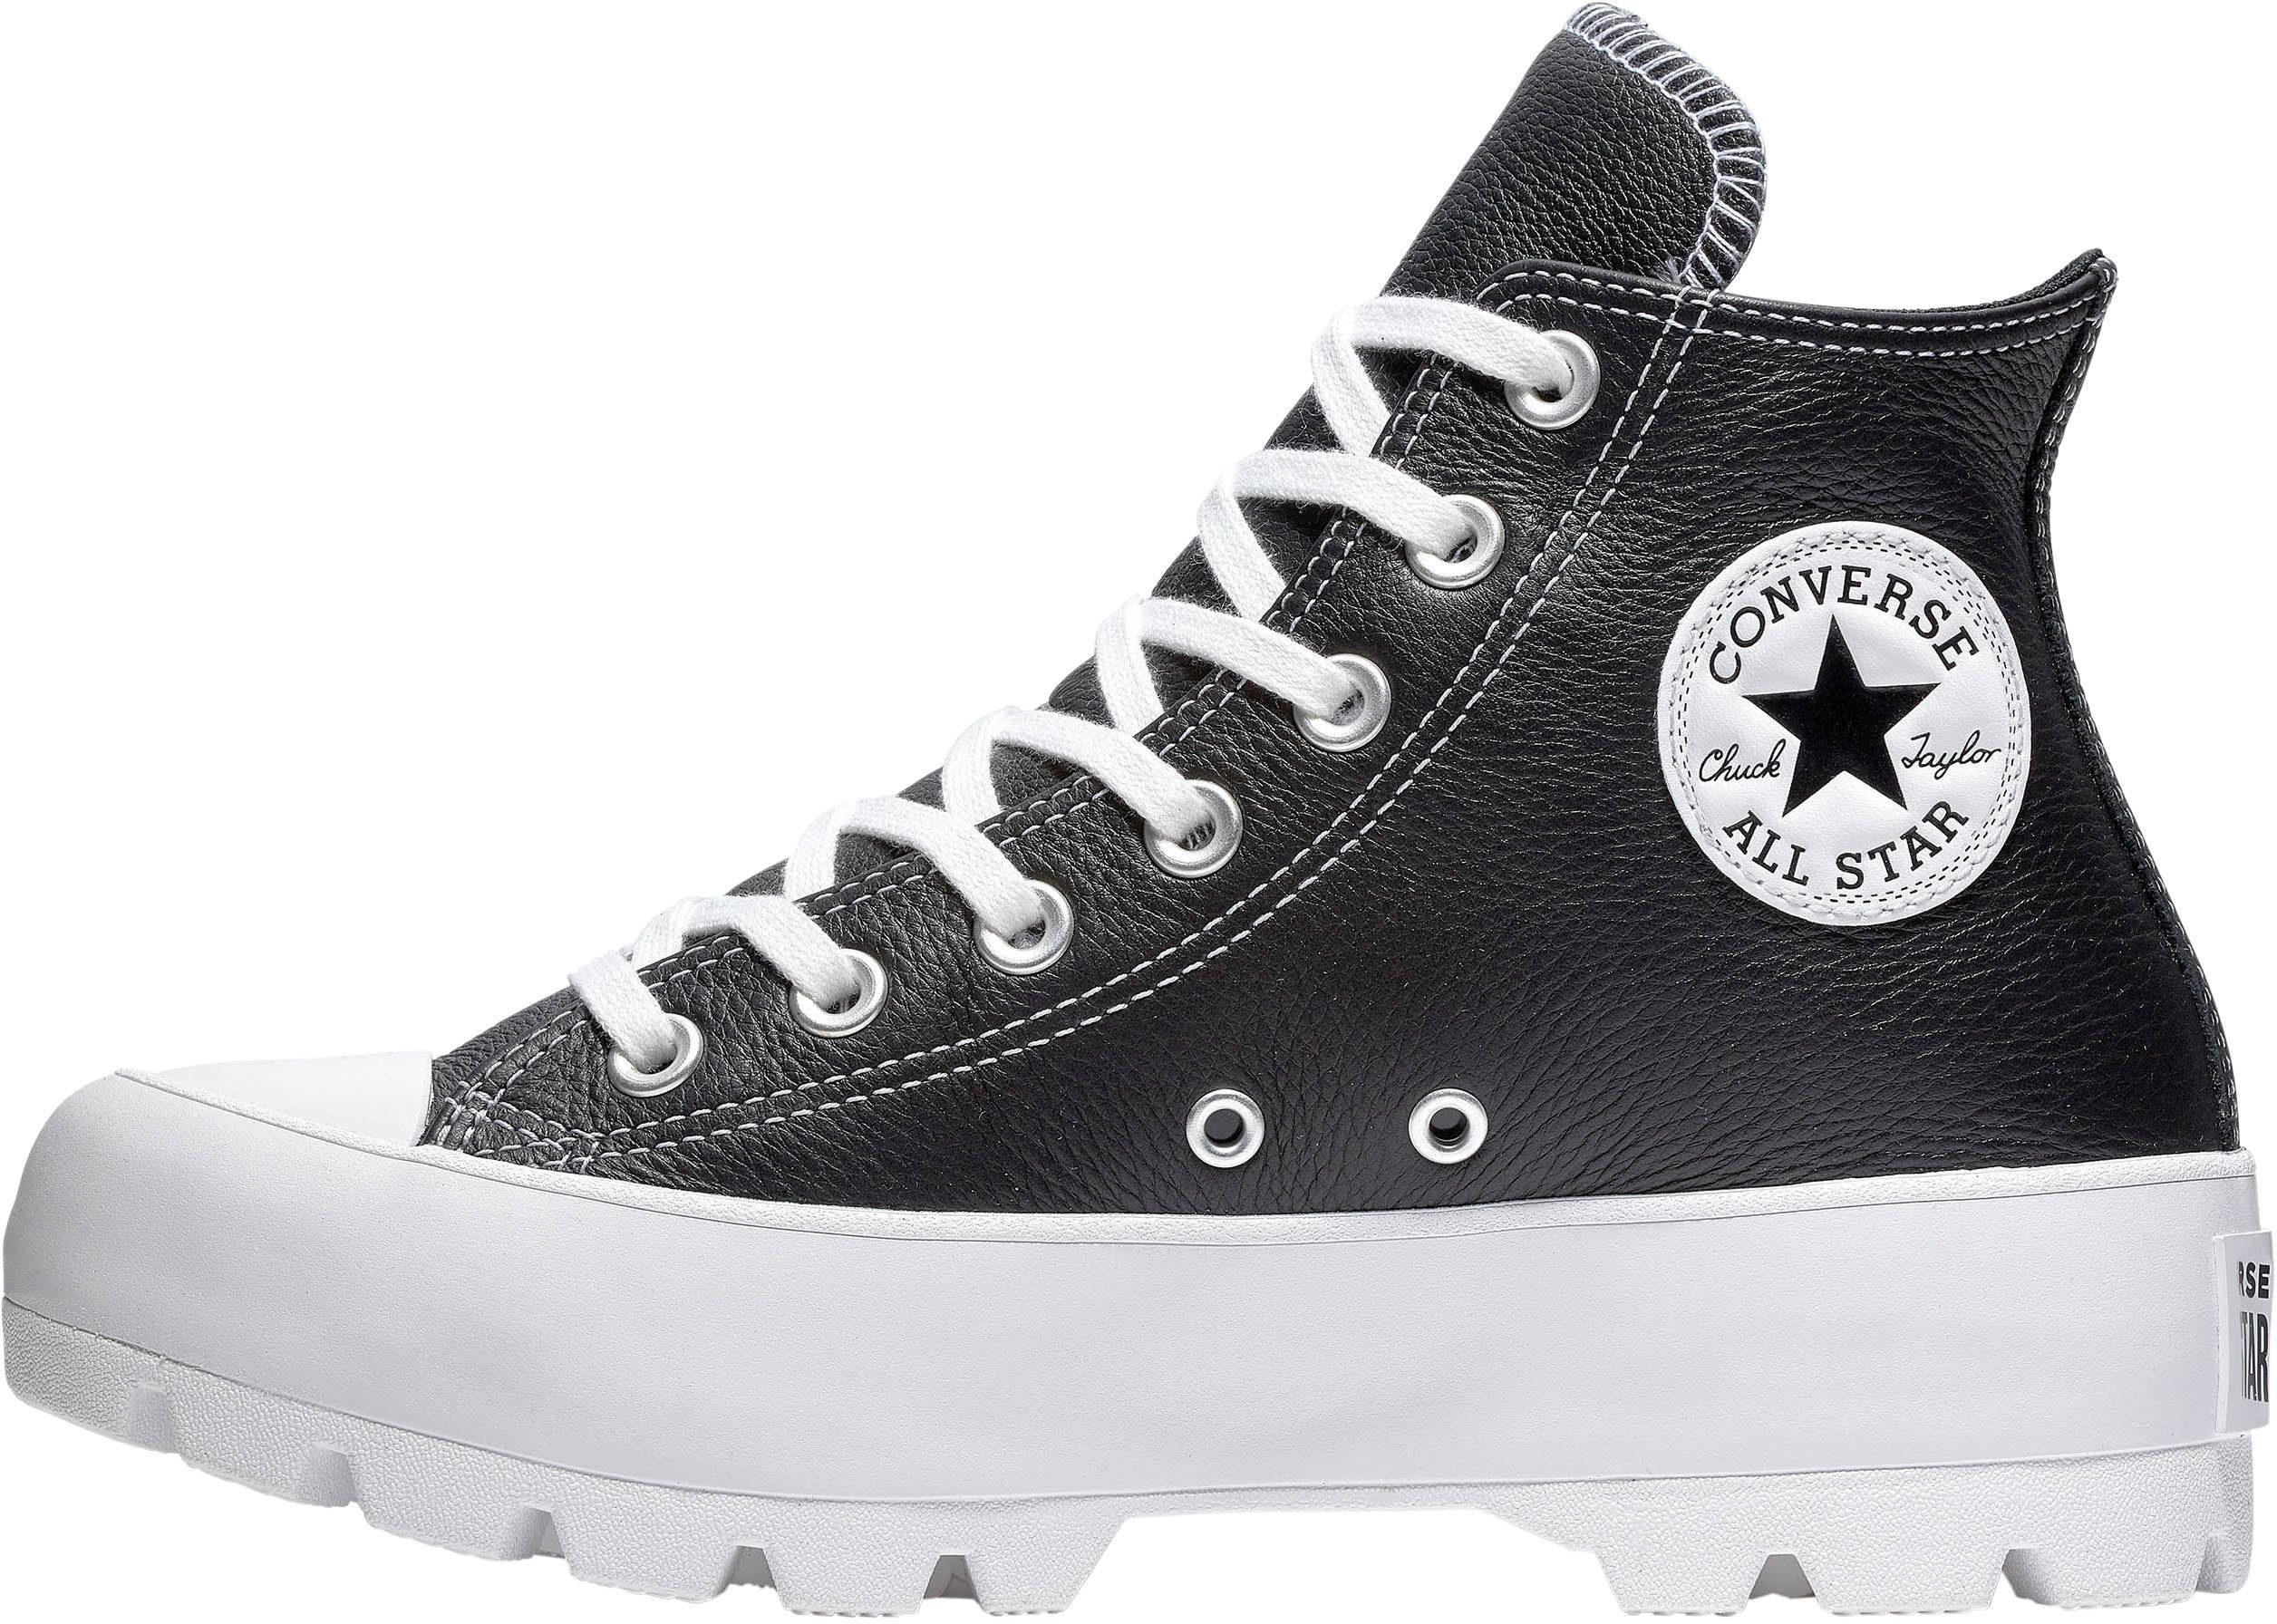 All Stars kopen? Keuze uit ruim 170 All stars schoenen | OTTO